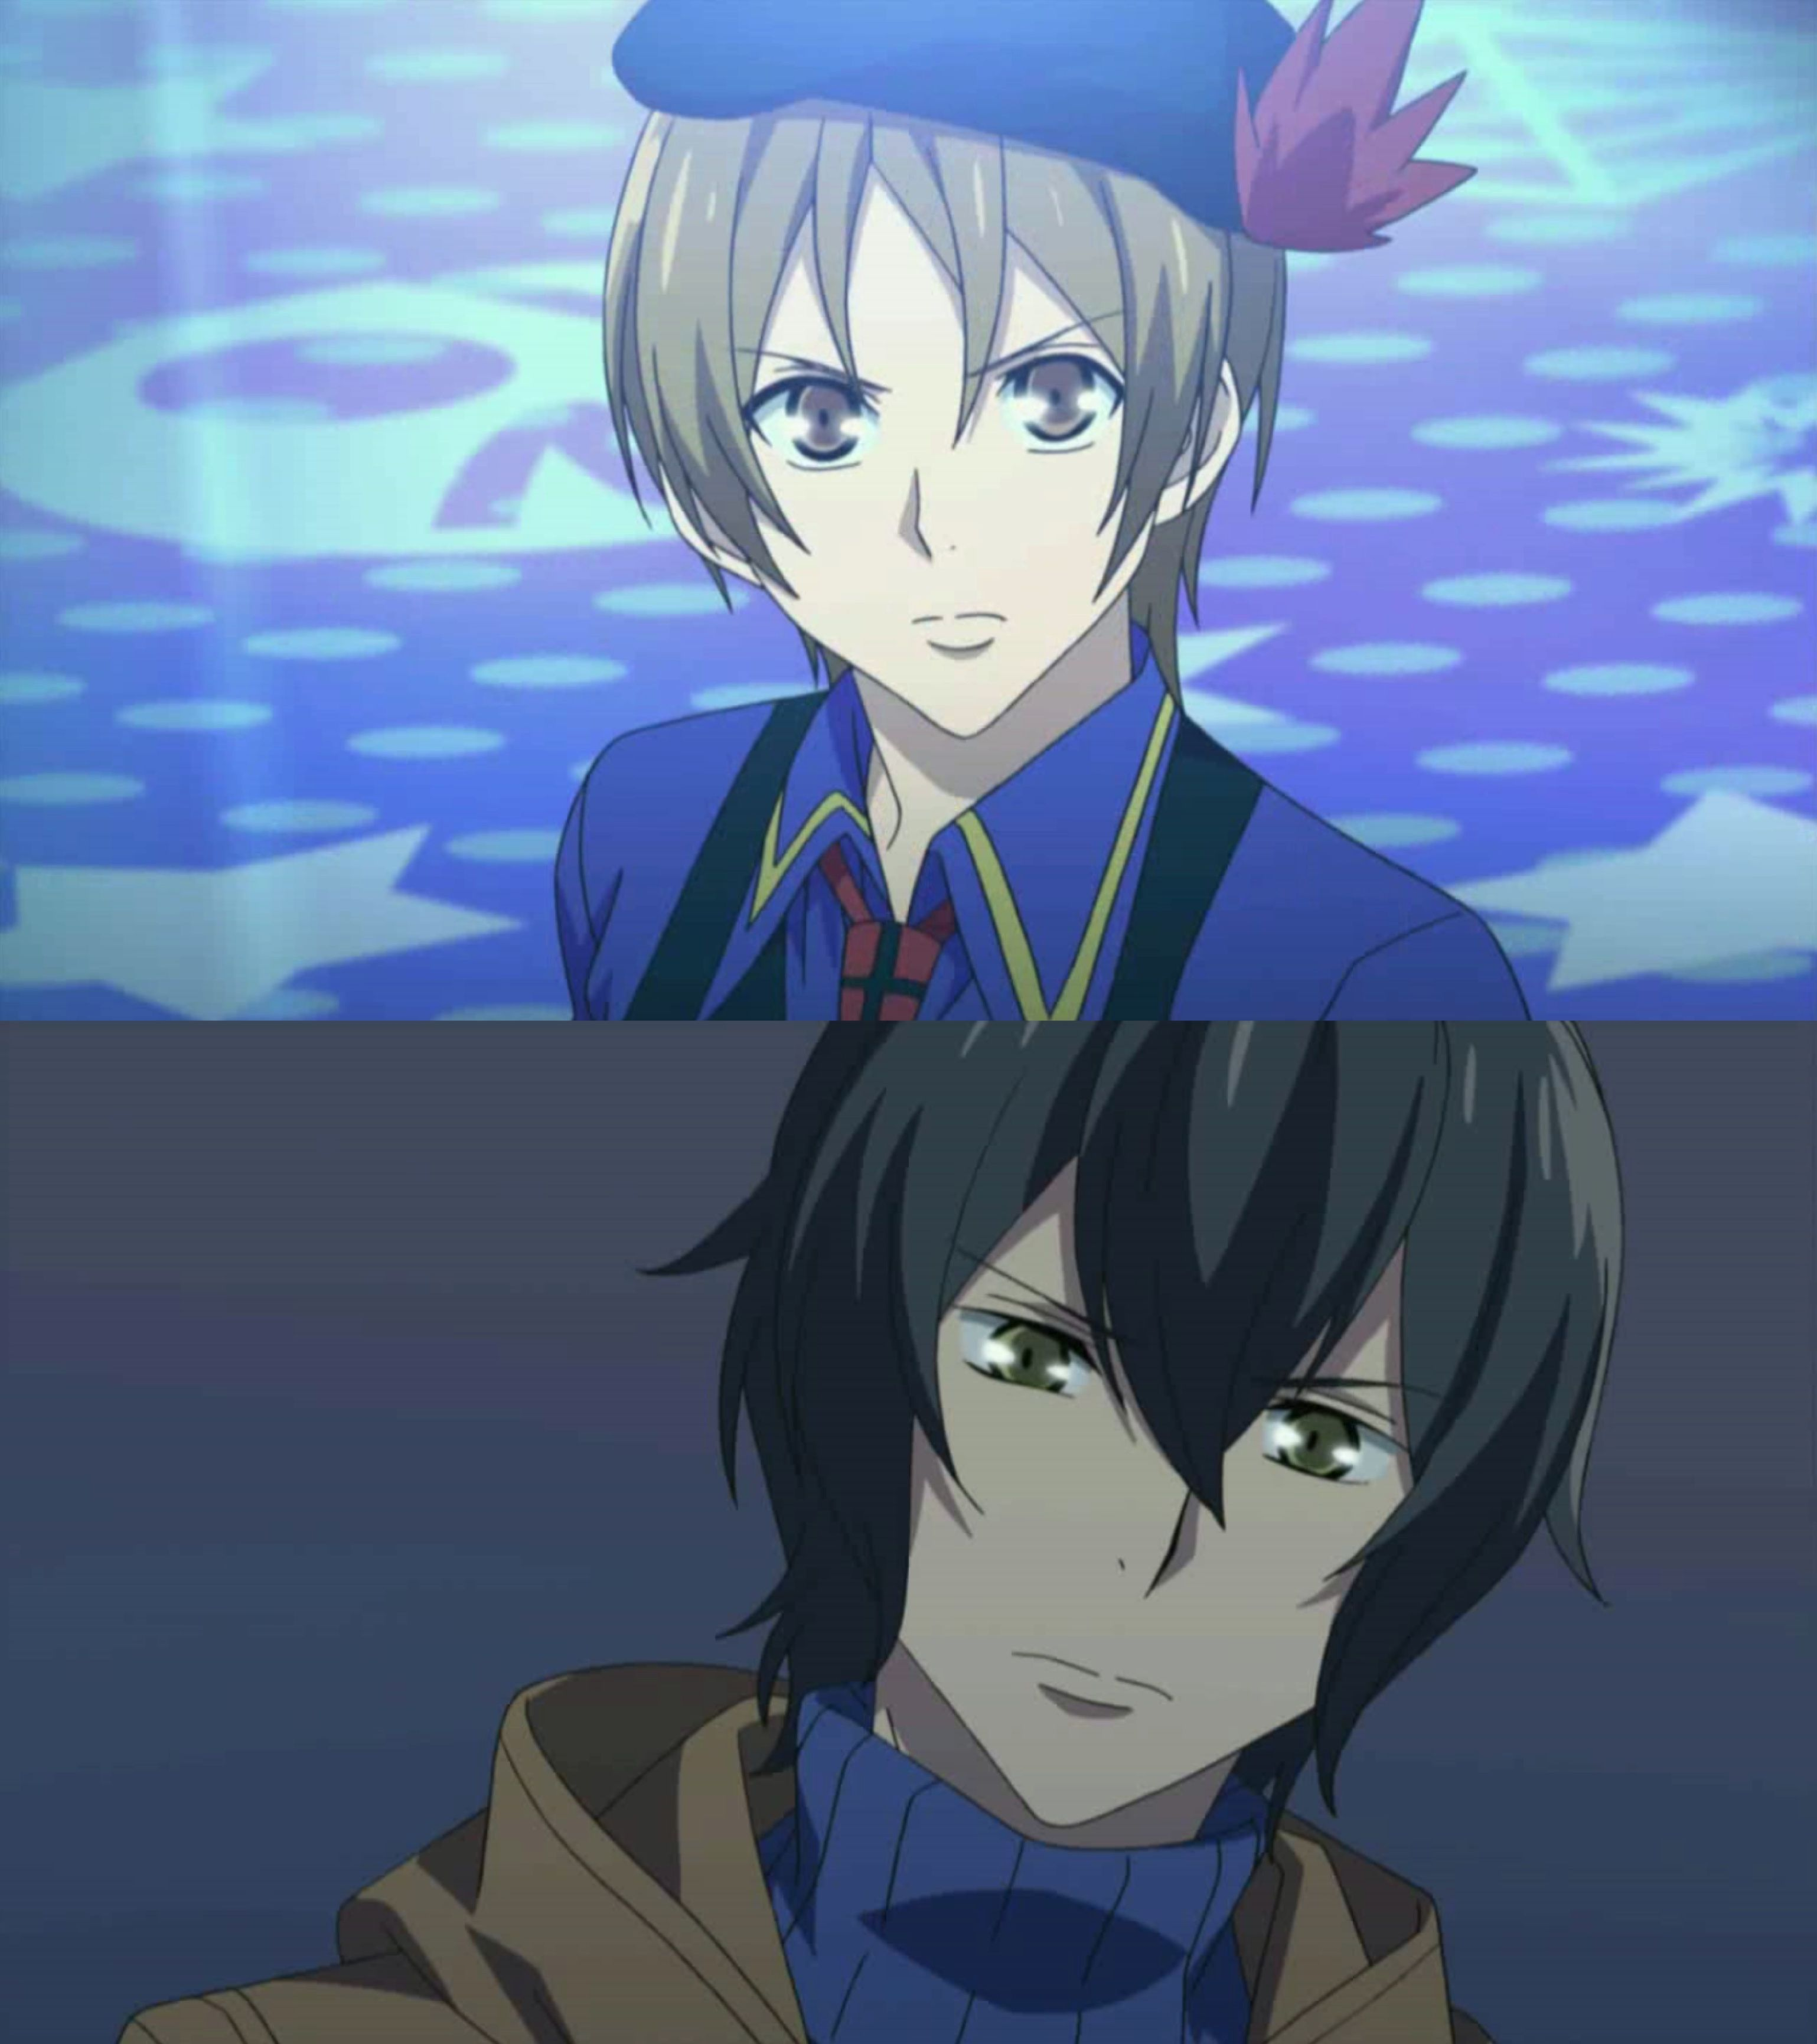 King of prism Over the rainbow Hiro Kouji Kojihiro 킹